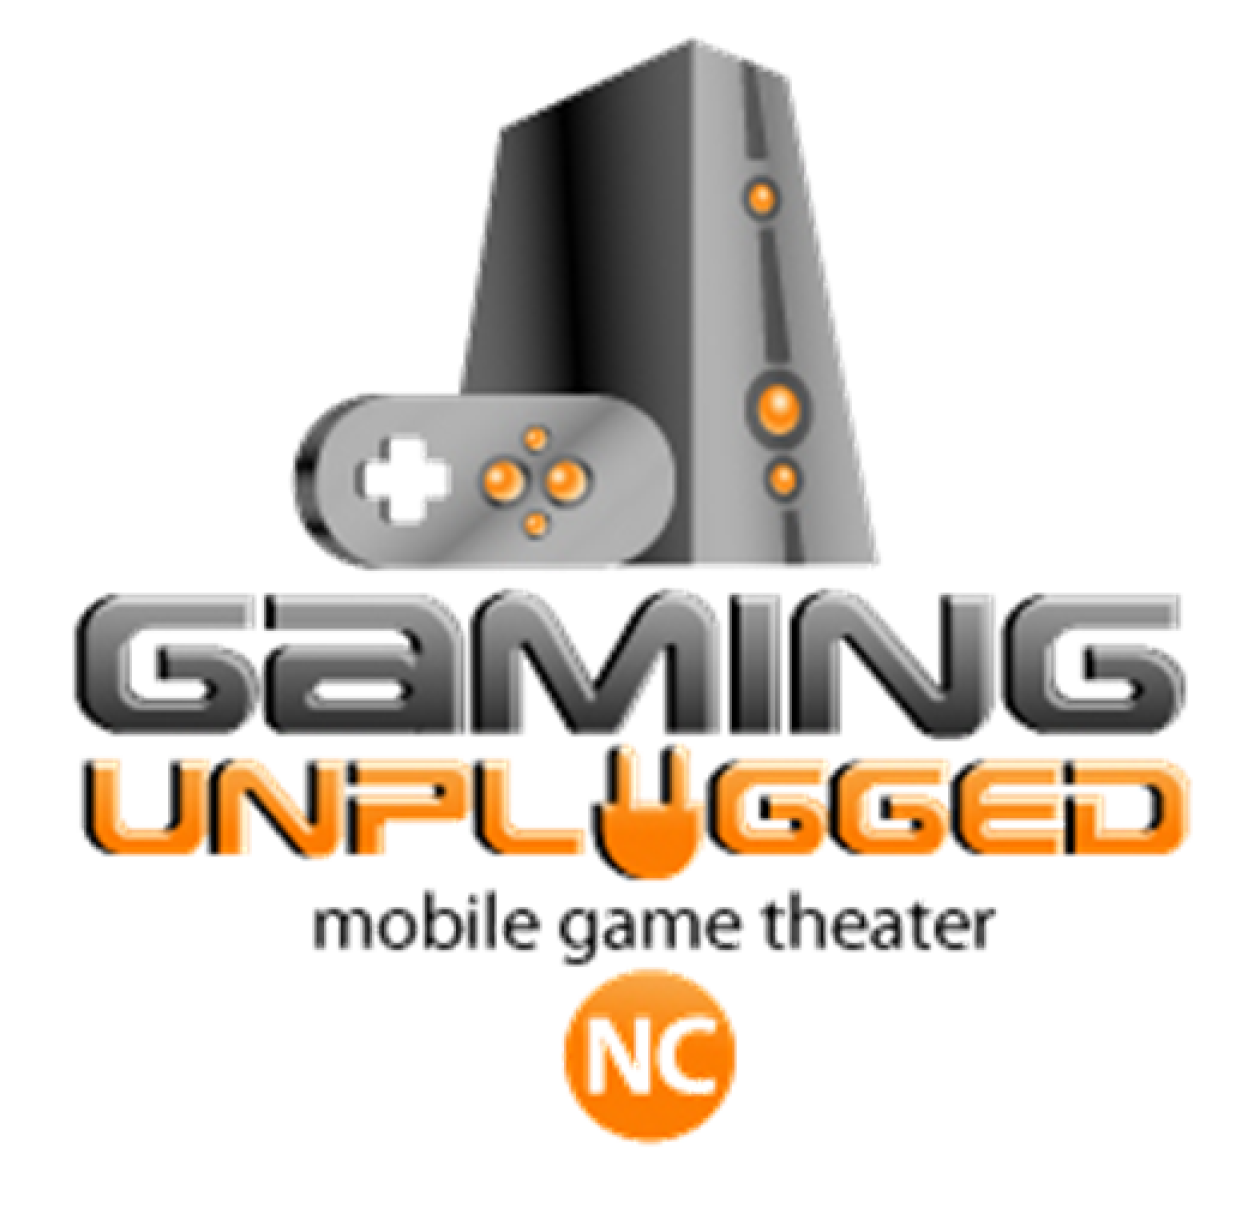 Gaming UnpluggedNC